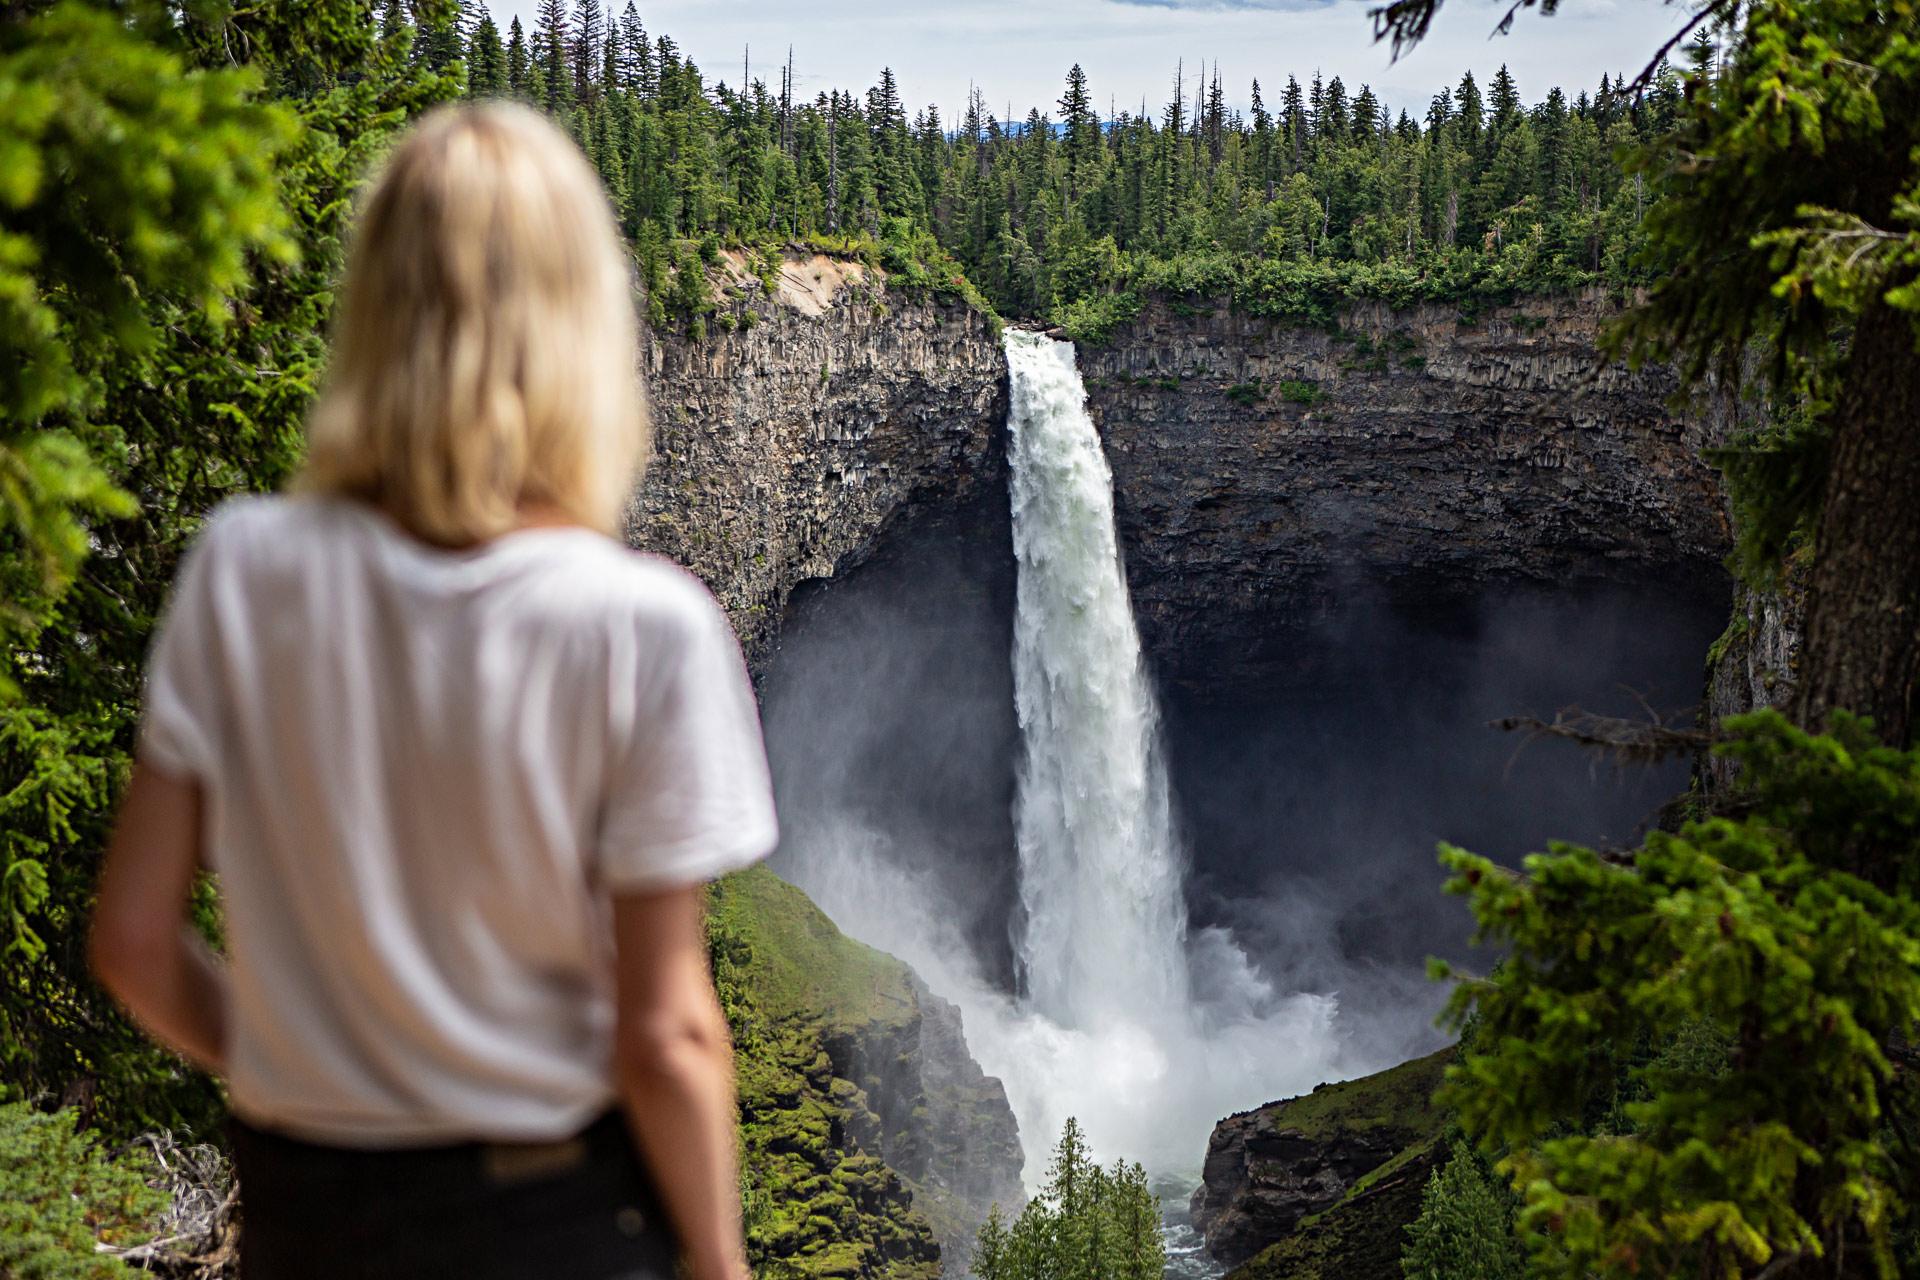 Helmcken Falls Colombie-Britannique Canada